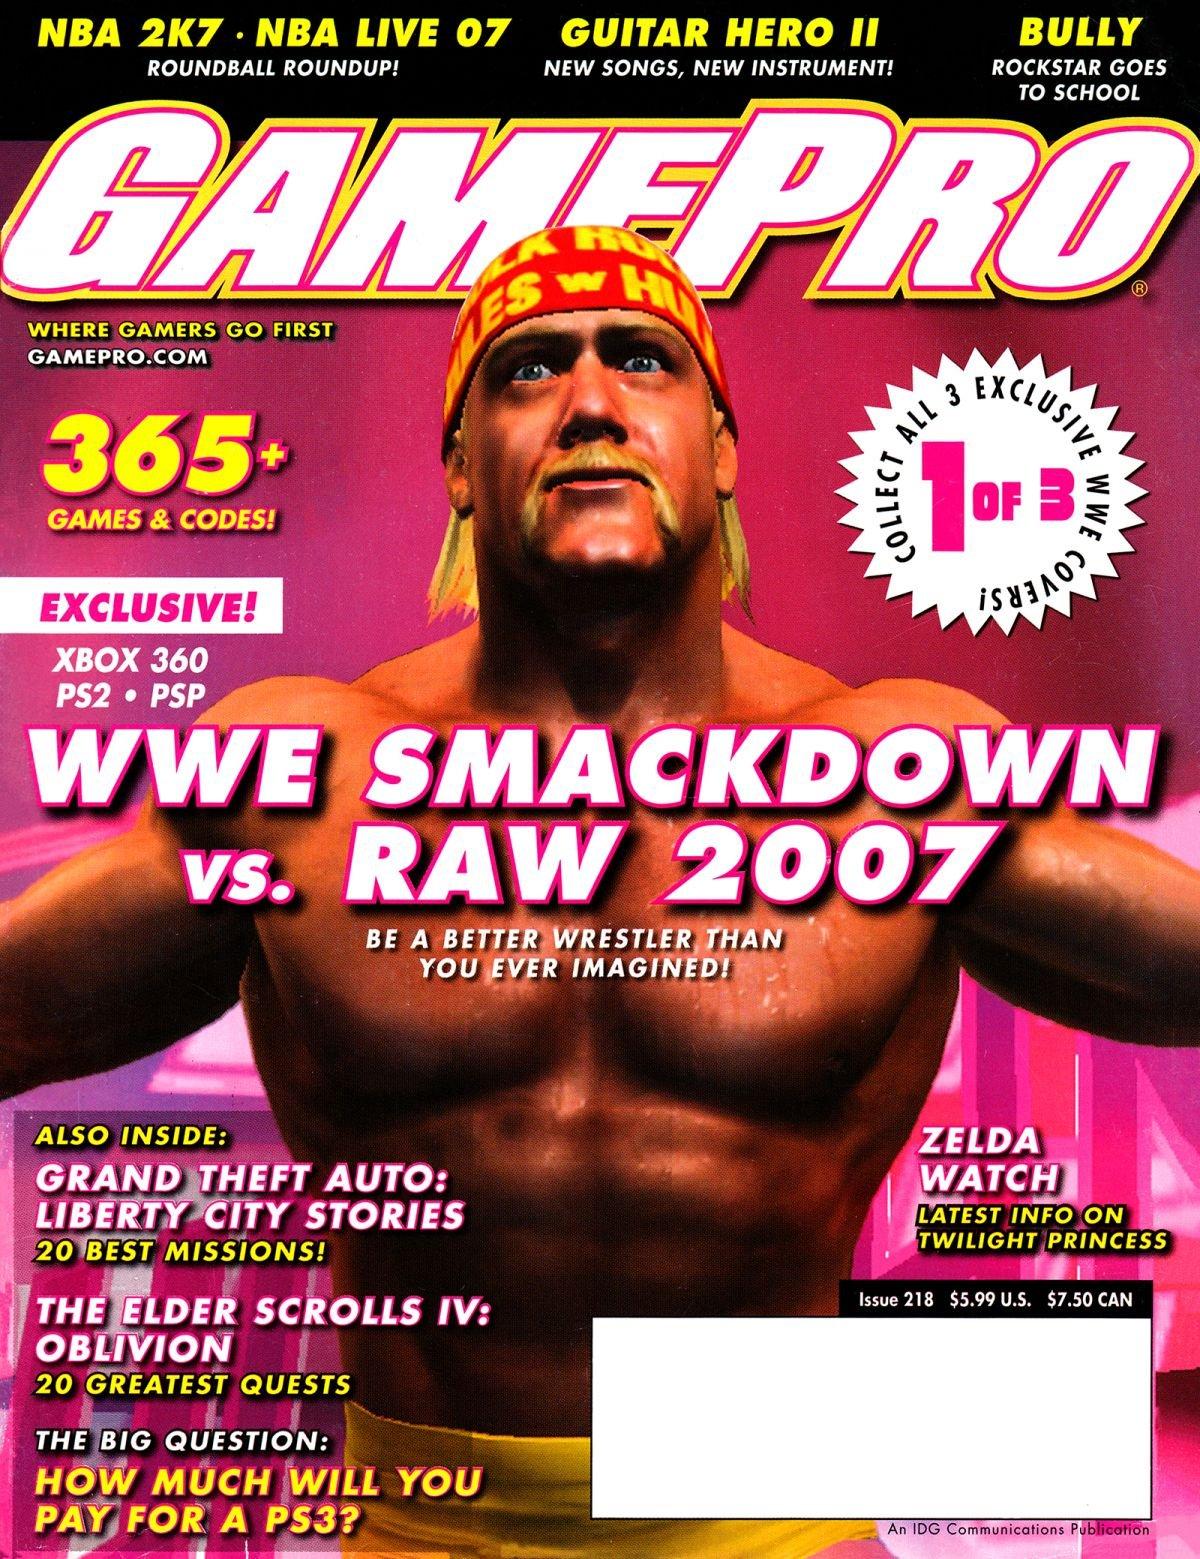 GamePro Issue 218 November 2006 (Cover 1 of 3)